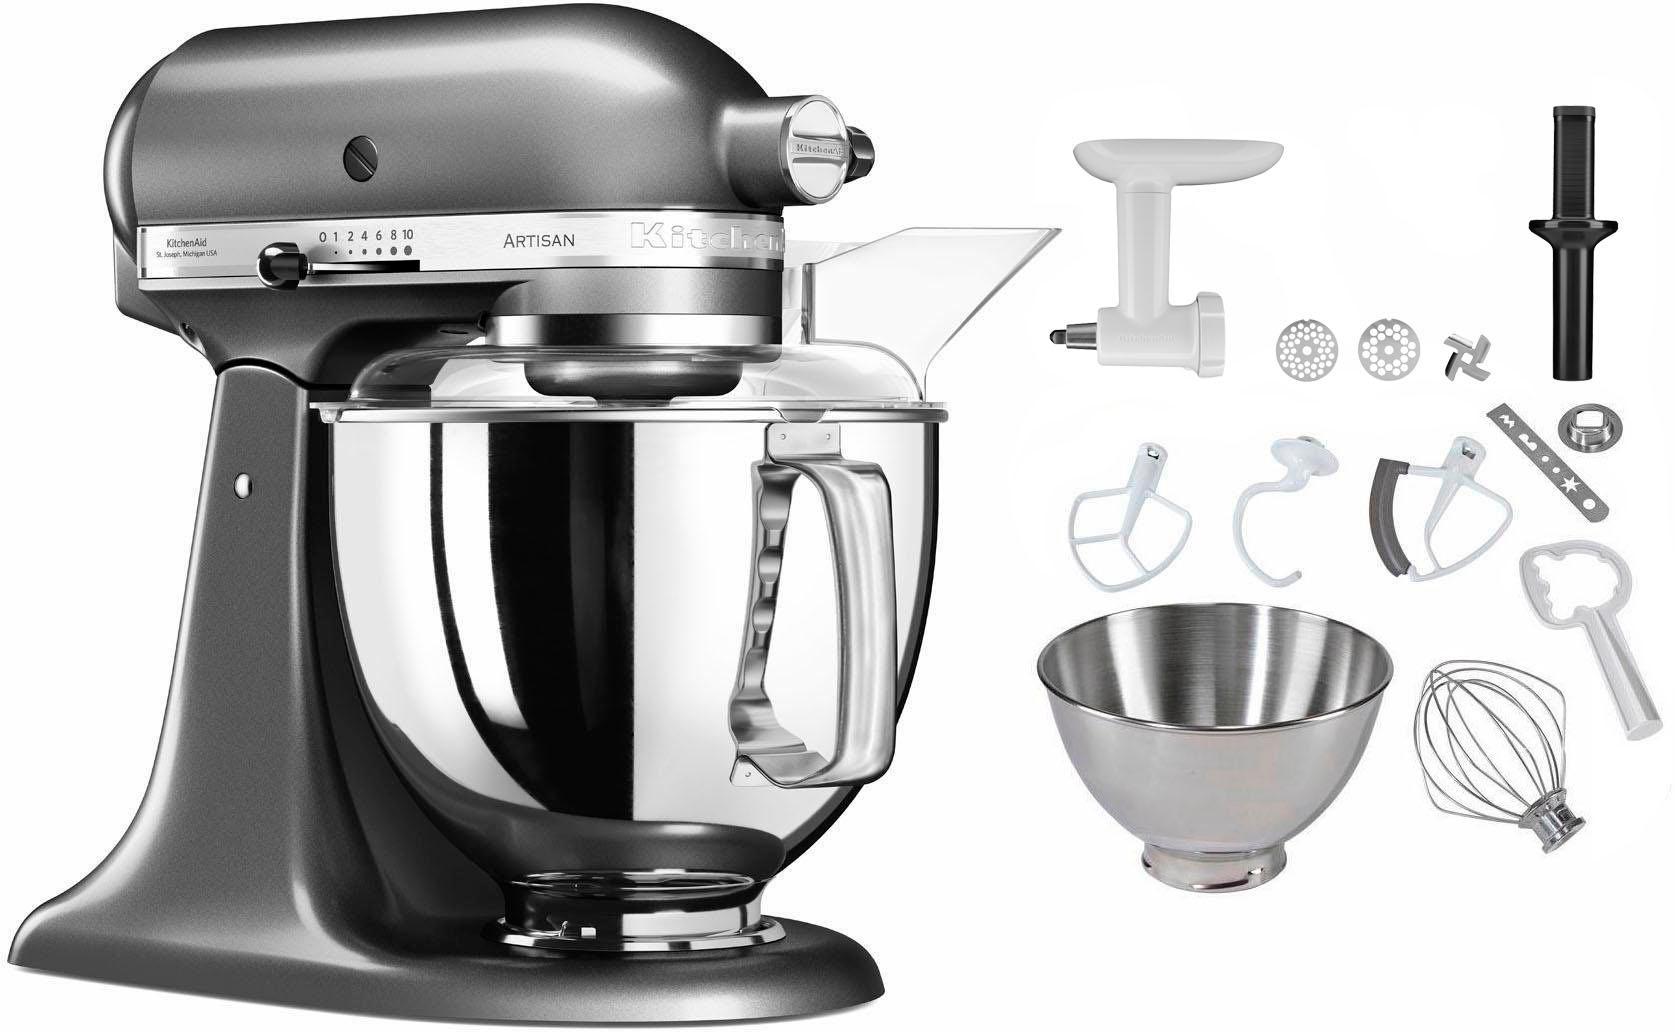 Kitchenaid 5Ksm150Psemc Artisan Küchenmaschine Grau 300 Watt 2021